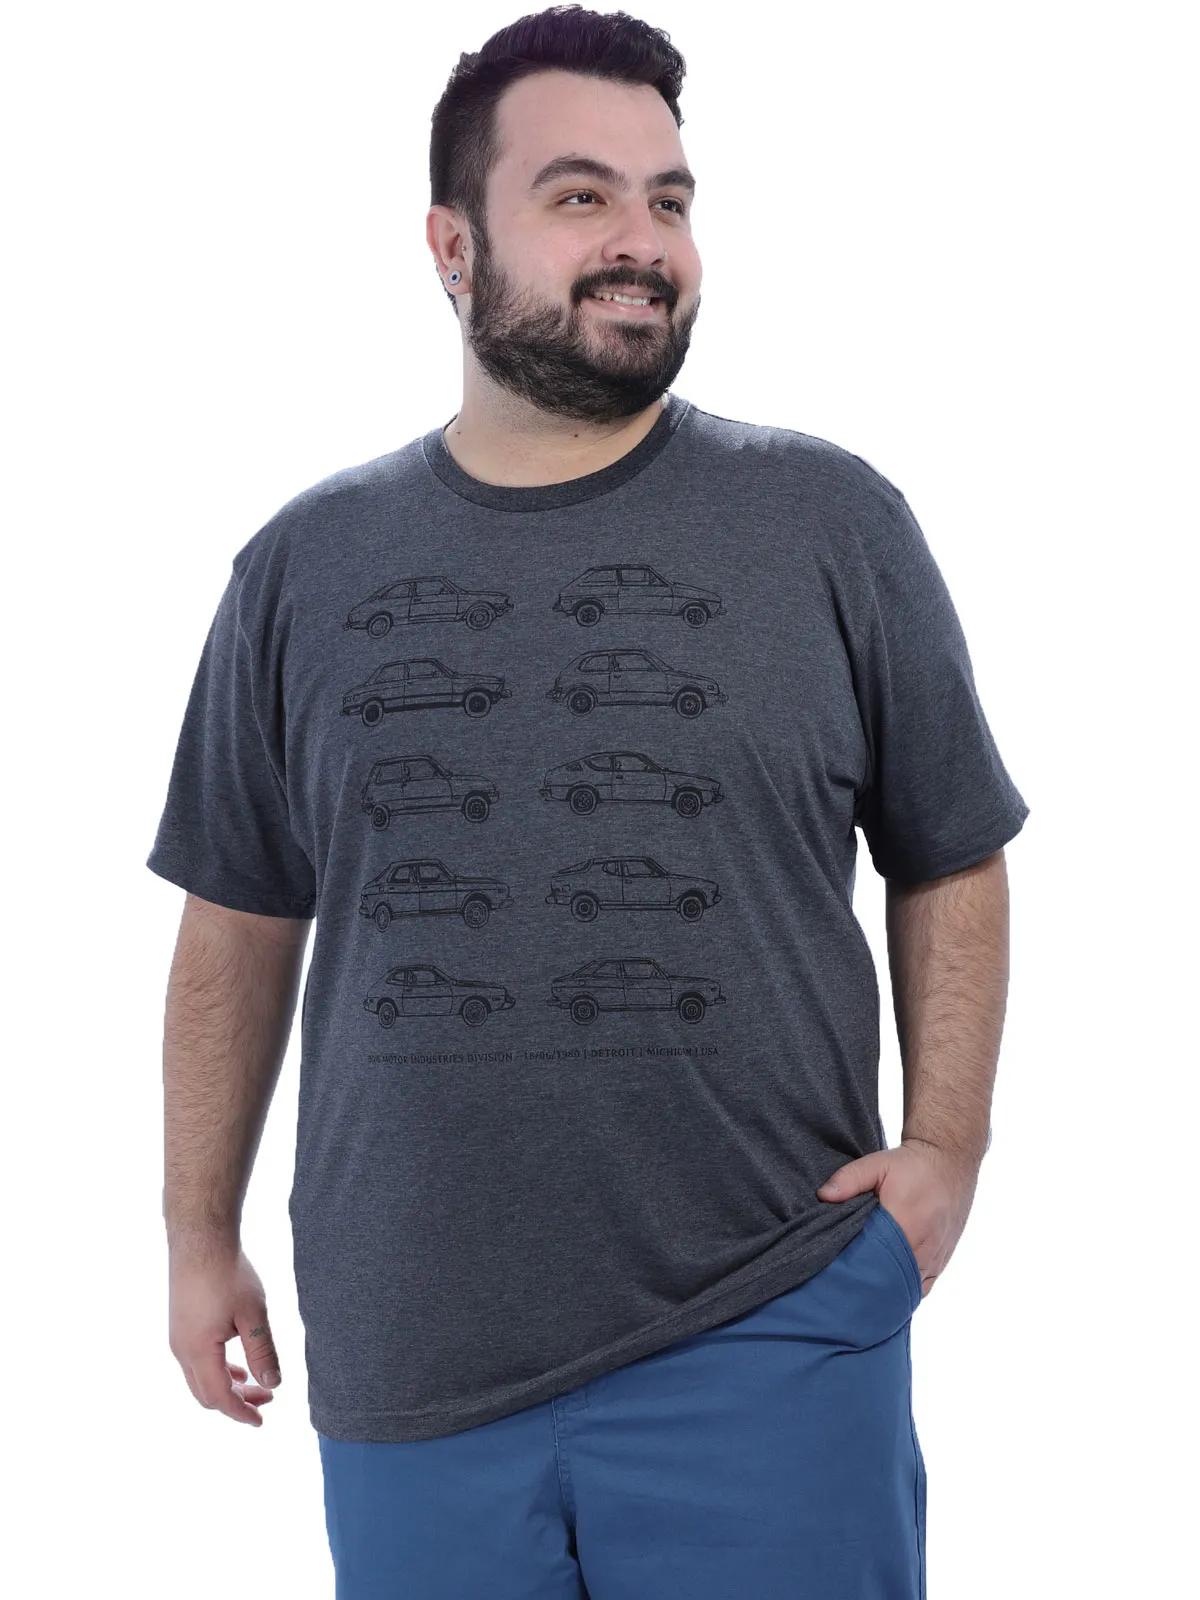 Camiseta Plus Size Masculino Manga Curta Estampada Mescla